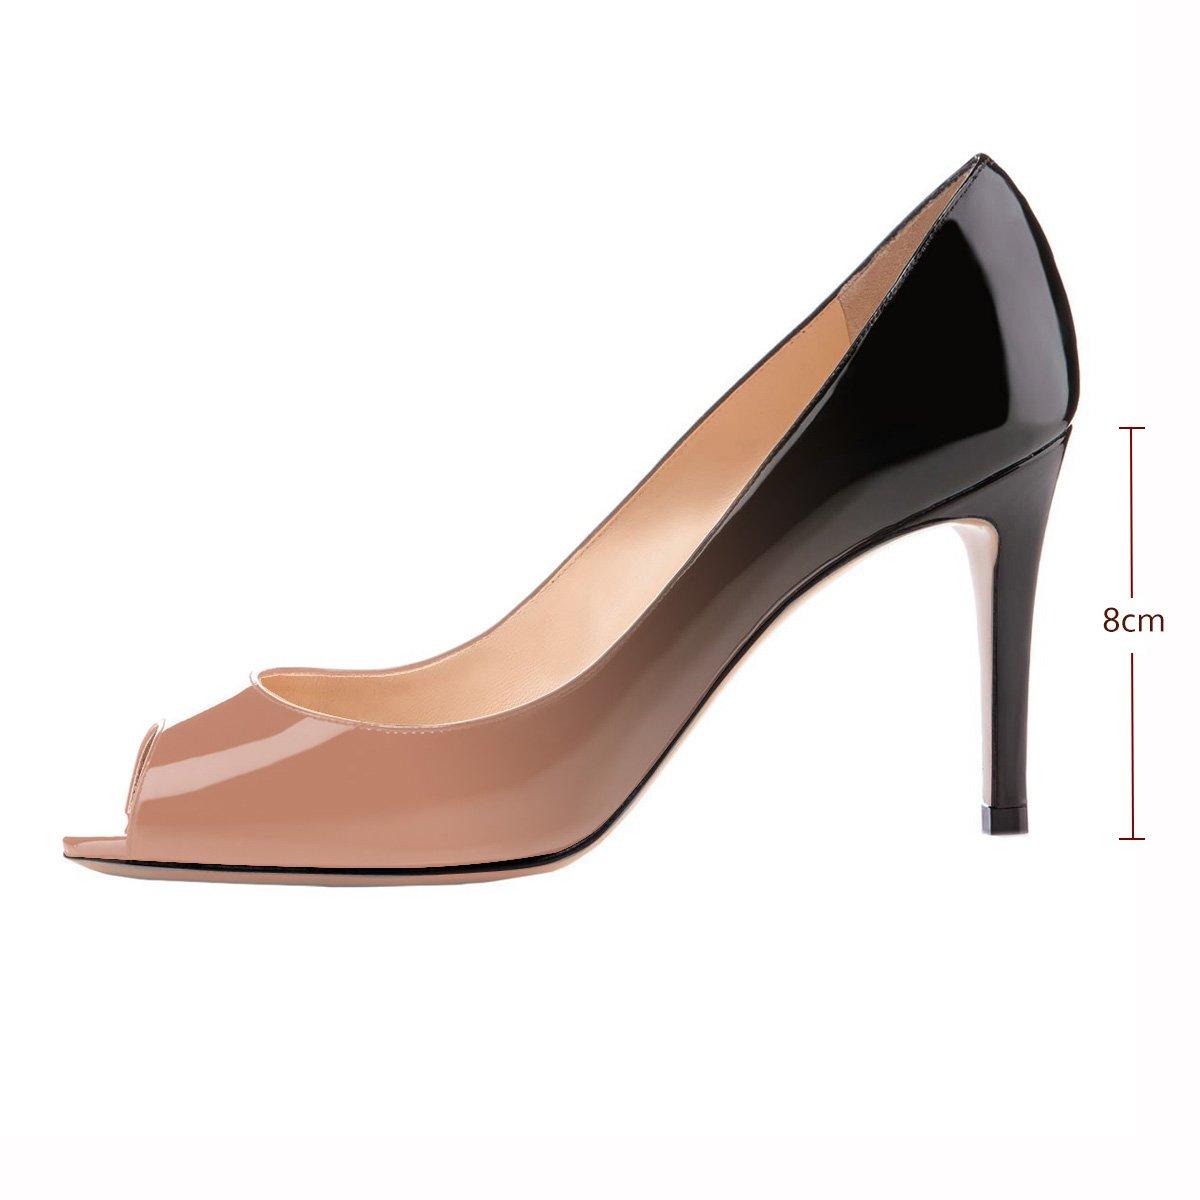 Eldof Women Peep Toe Pumps Mid-Heel Pumps Formal Wedding Bridal Classic Heel Open Toe Stiletto B07F8LTHZ2 9 B(M) US|Beige-black